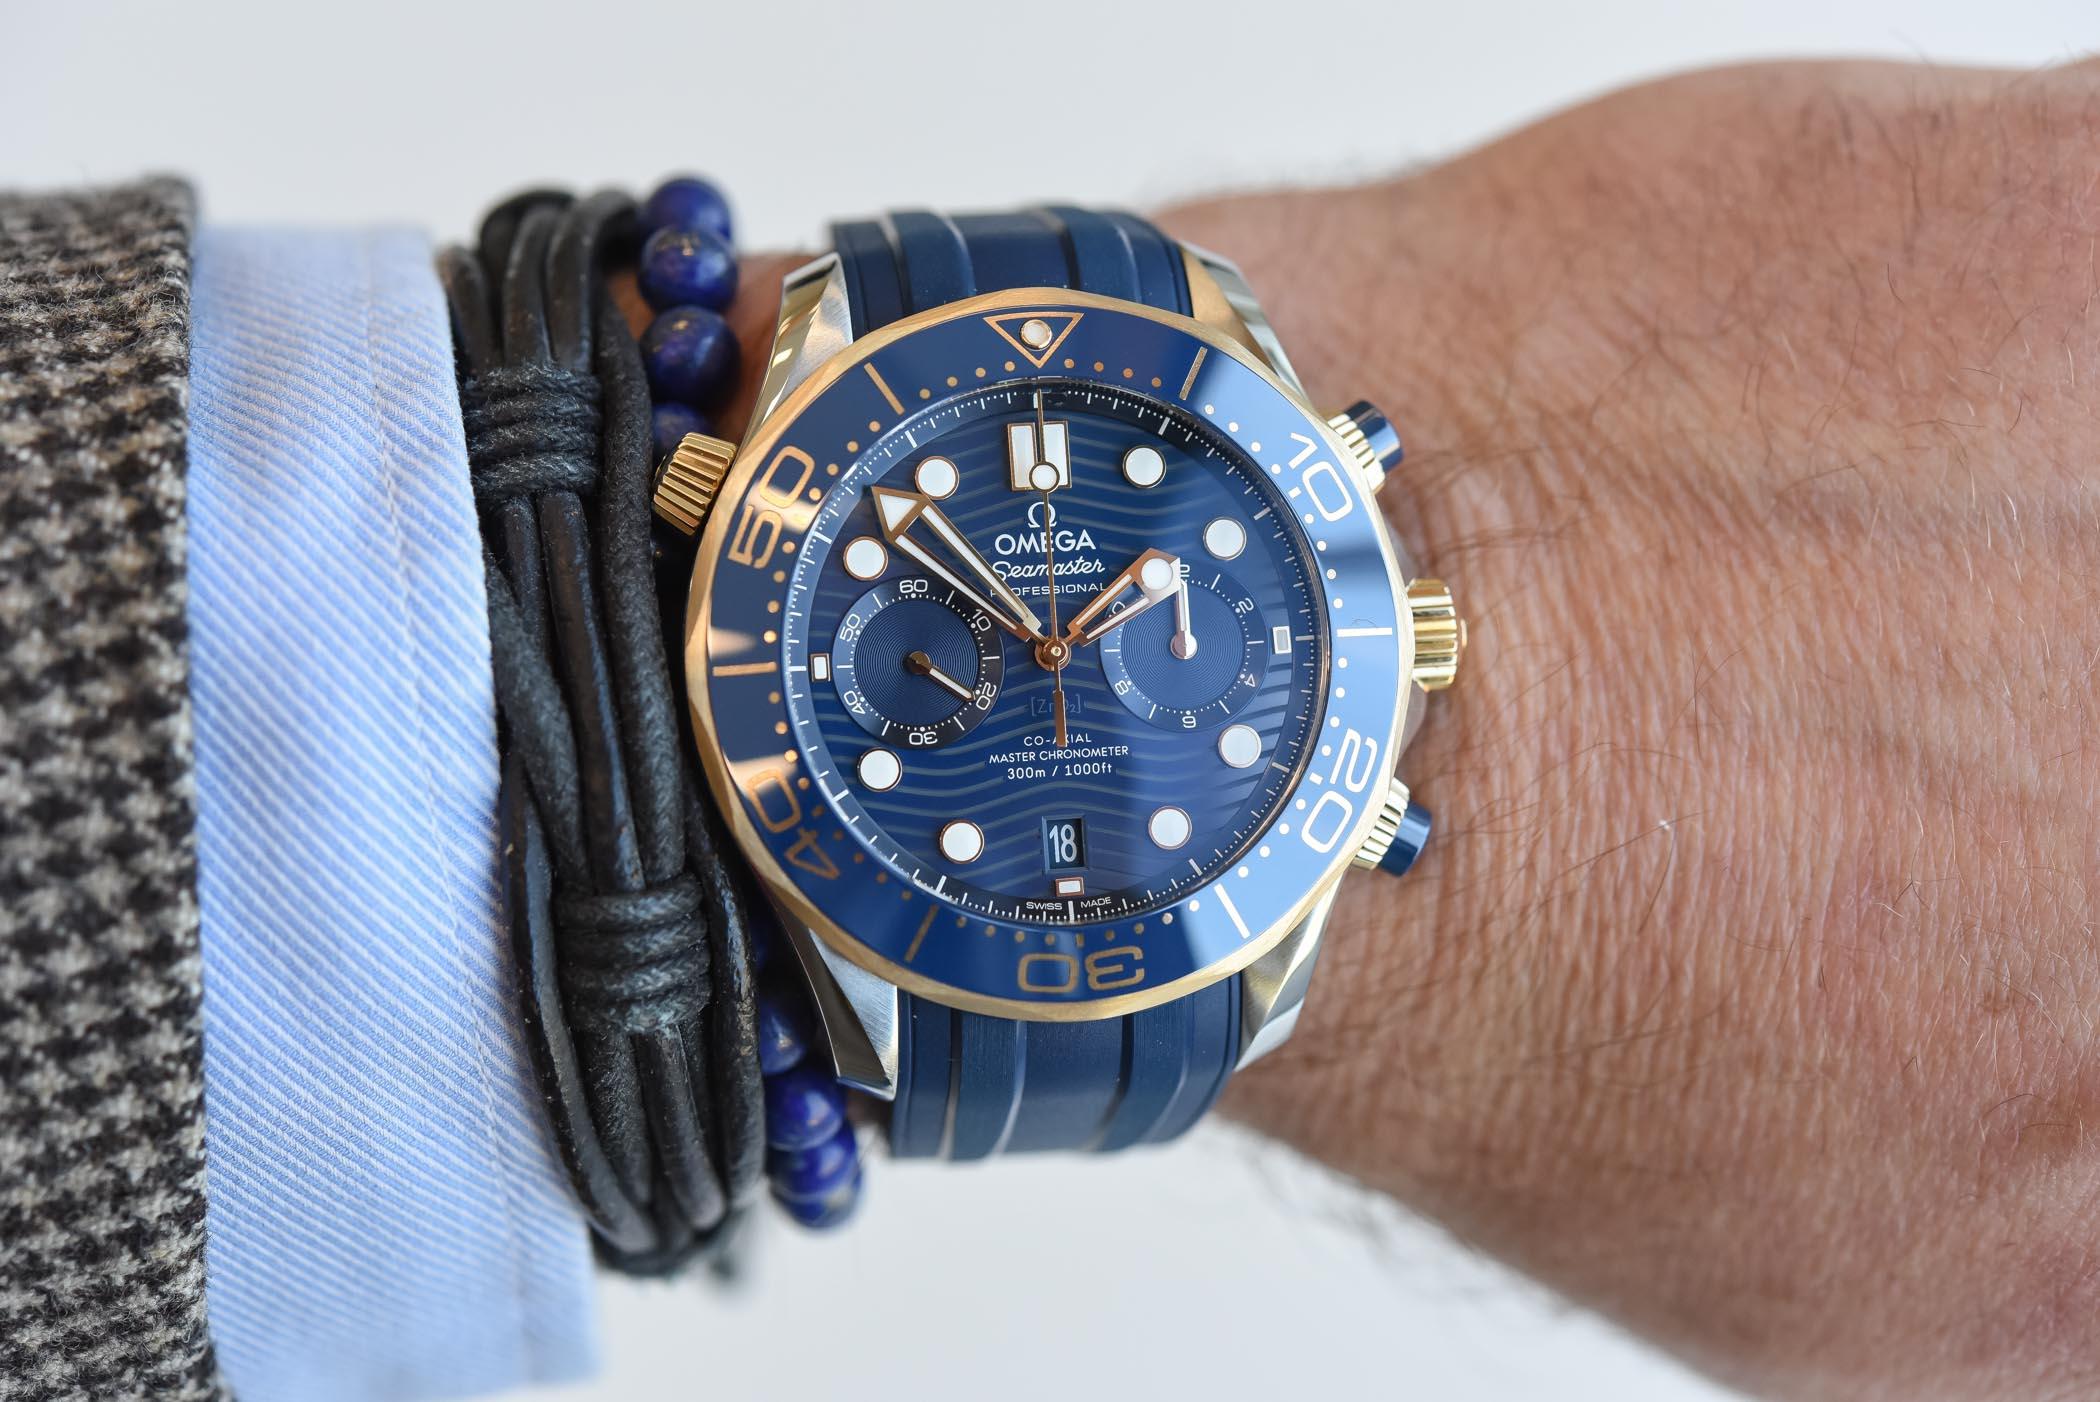 omega seamaster diver 300m chronograph  hands